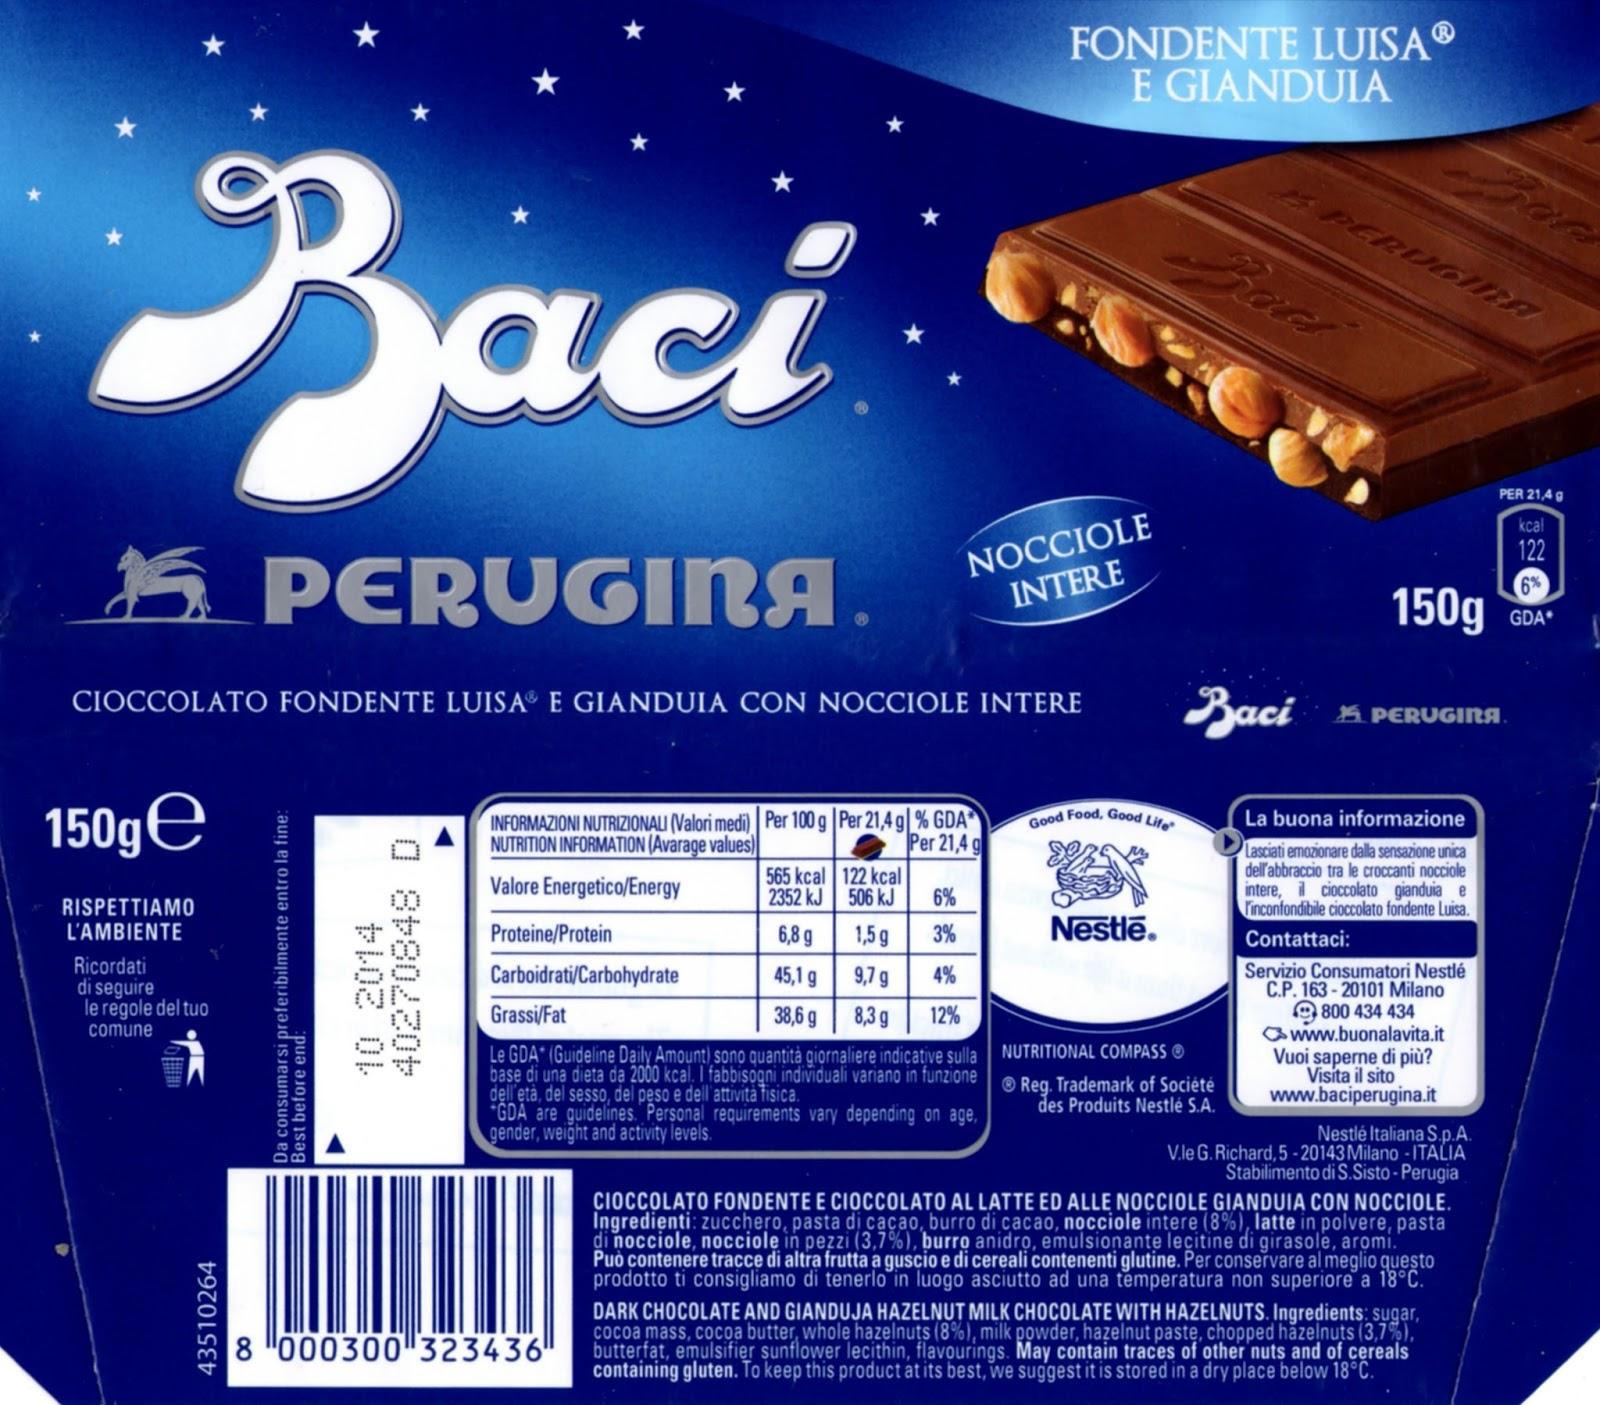 tablette de chocolat lait gourmand nestlé baci fondente luisa e gianduja